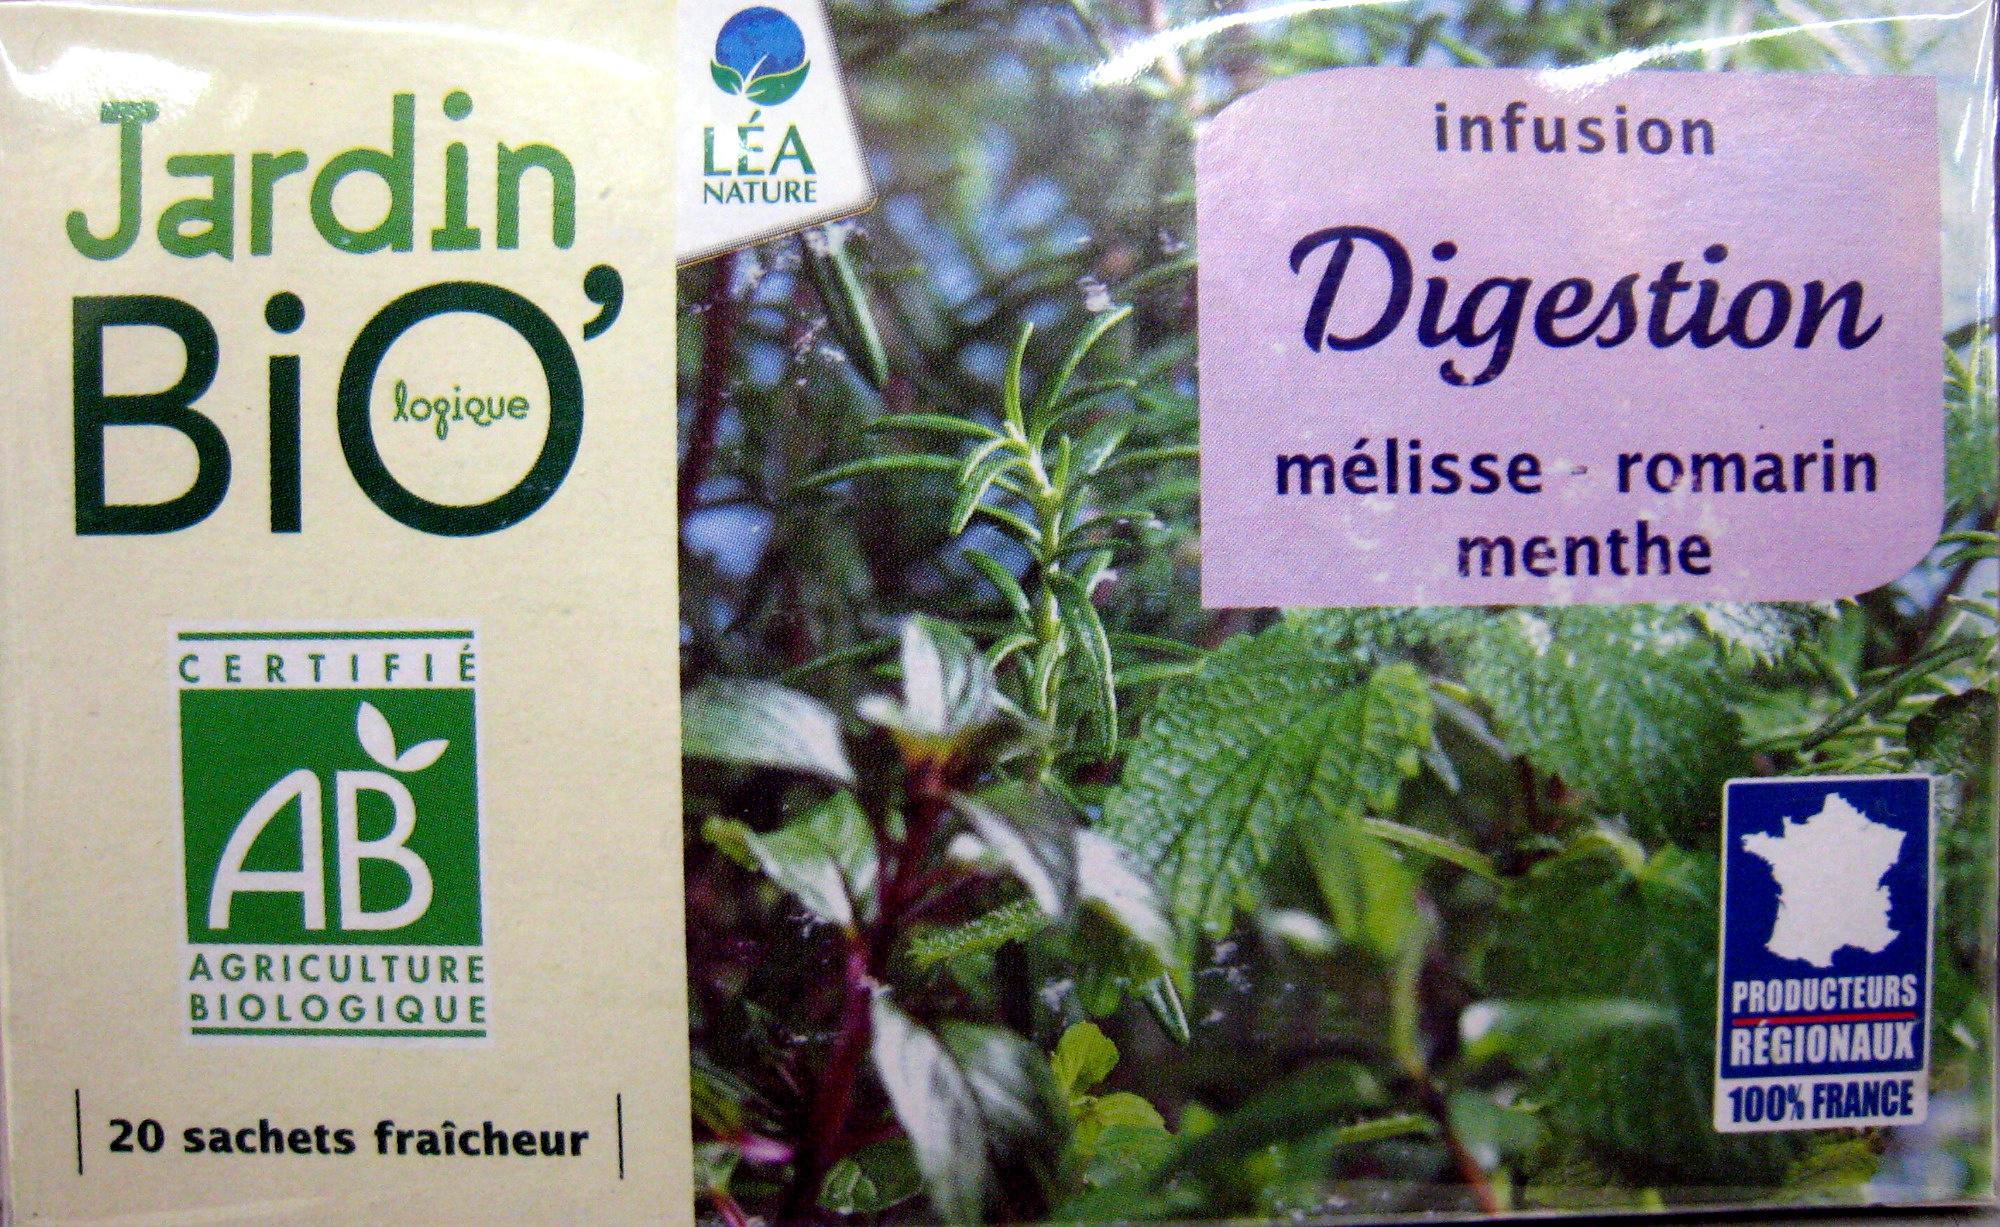 Infusion Digestion - Jardin Bio - 30 G (20 Sachets De 1,5 G) dedans Infusion Jardin Bio